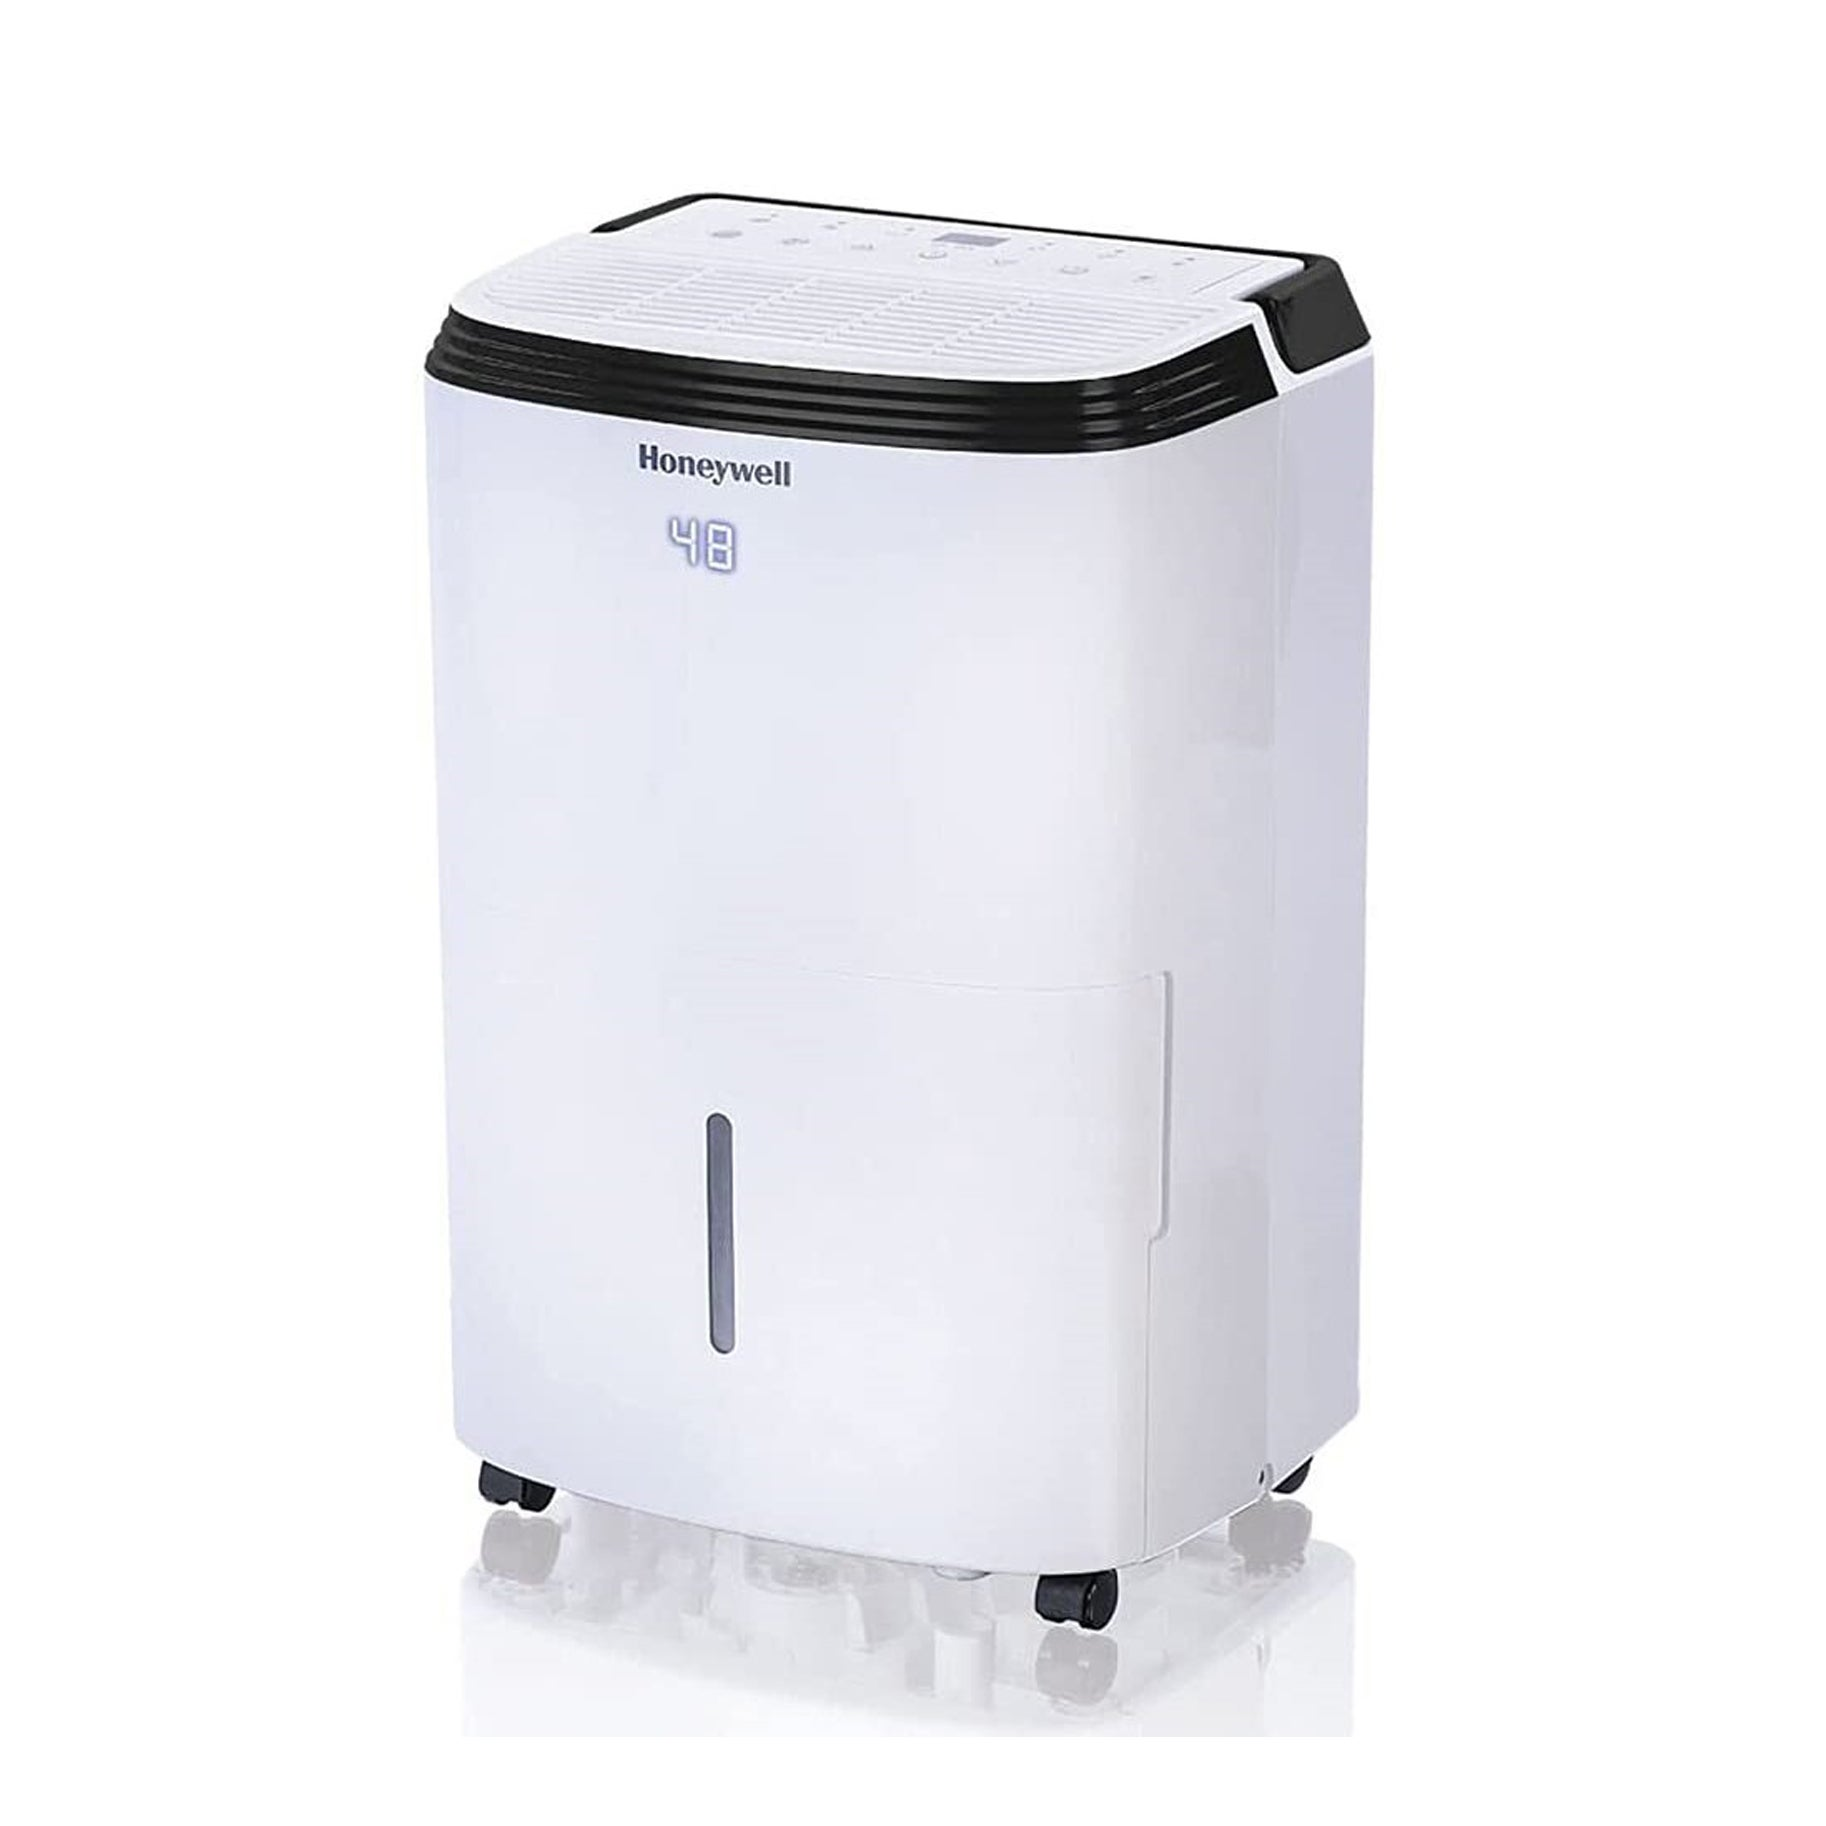 The-Best-Dehumidifiers-Option-Honeywell-Dehumidifier